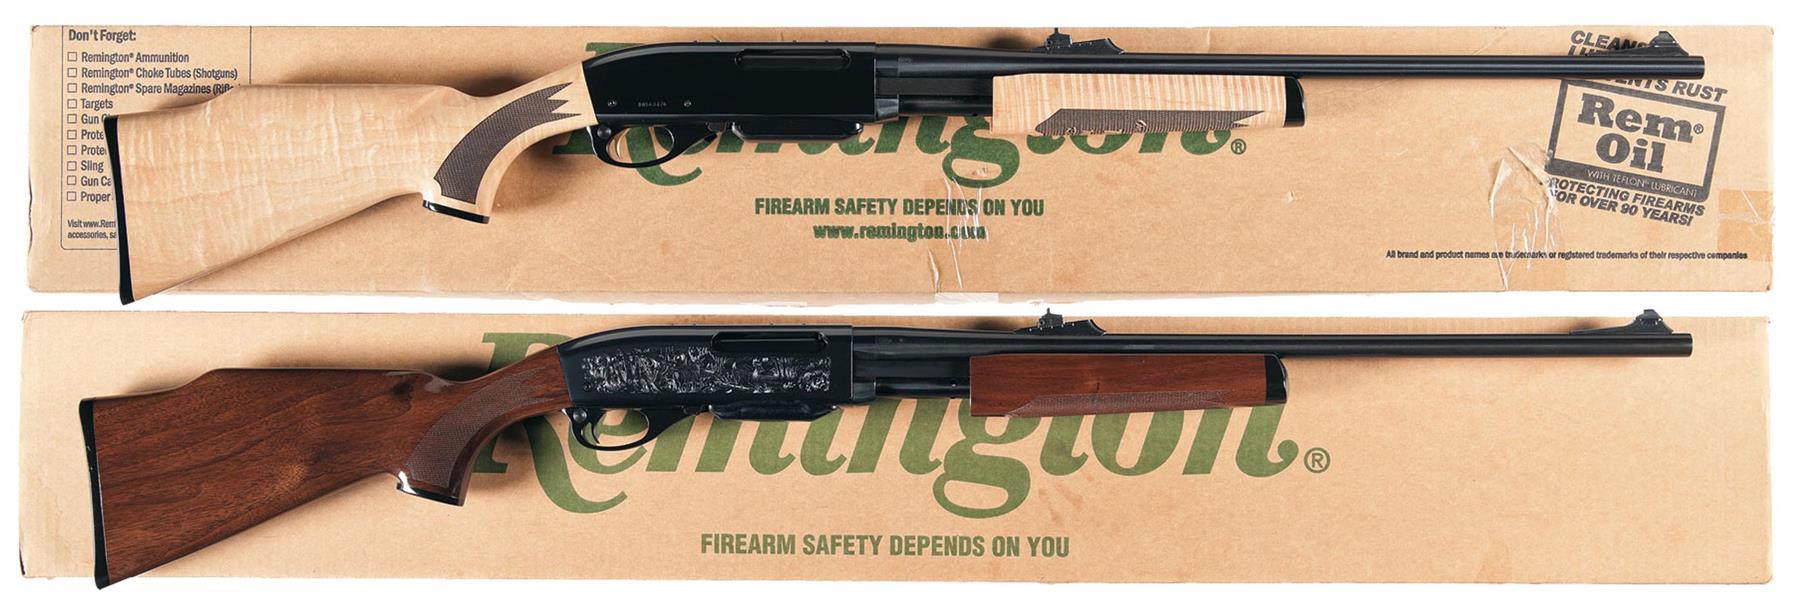 Two Boxed Remington Model 7600 Slide Action Rifles